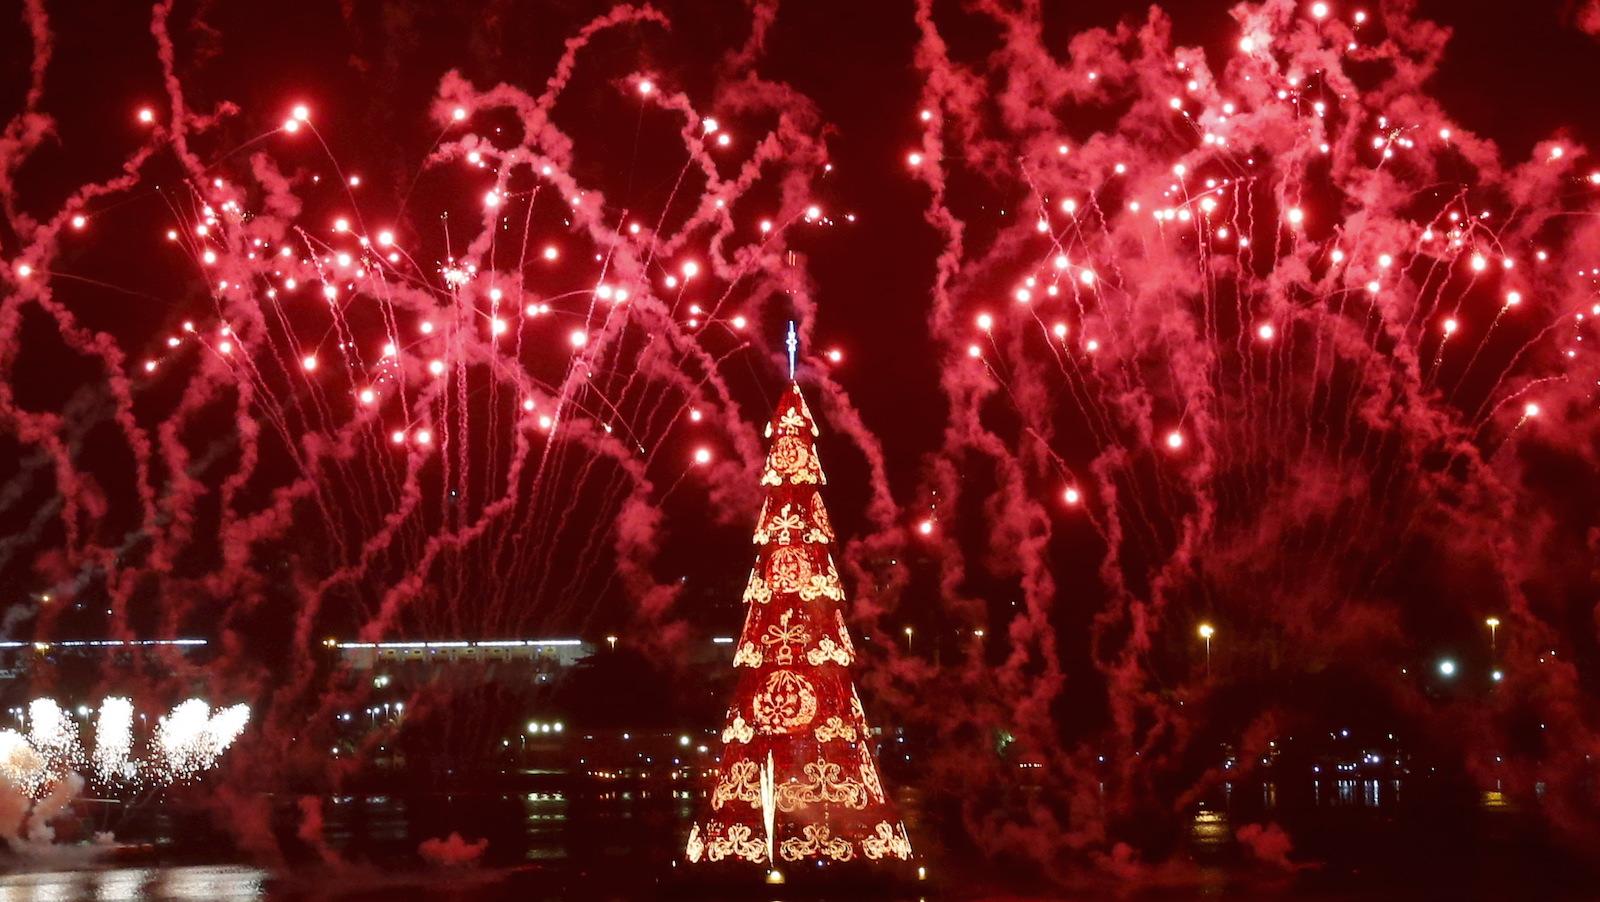 Fireworks explode around Rio's Christmas tree during its lighting ceremony at Rodrigo de Freitas Lagoon in Rio de Janeiro, Brazil